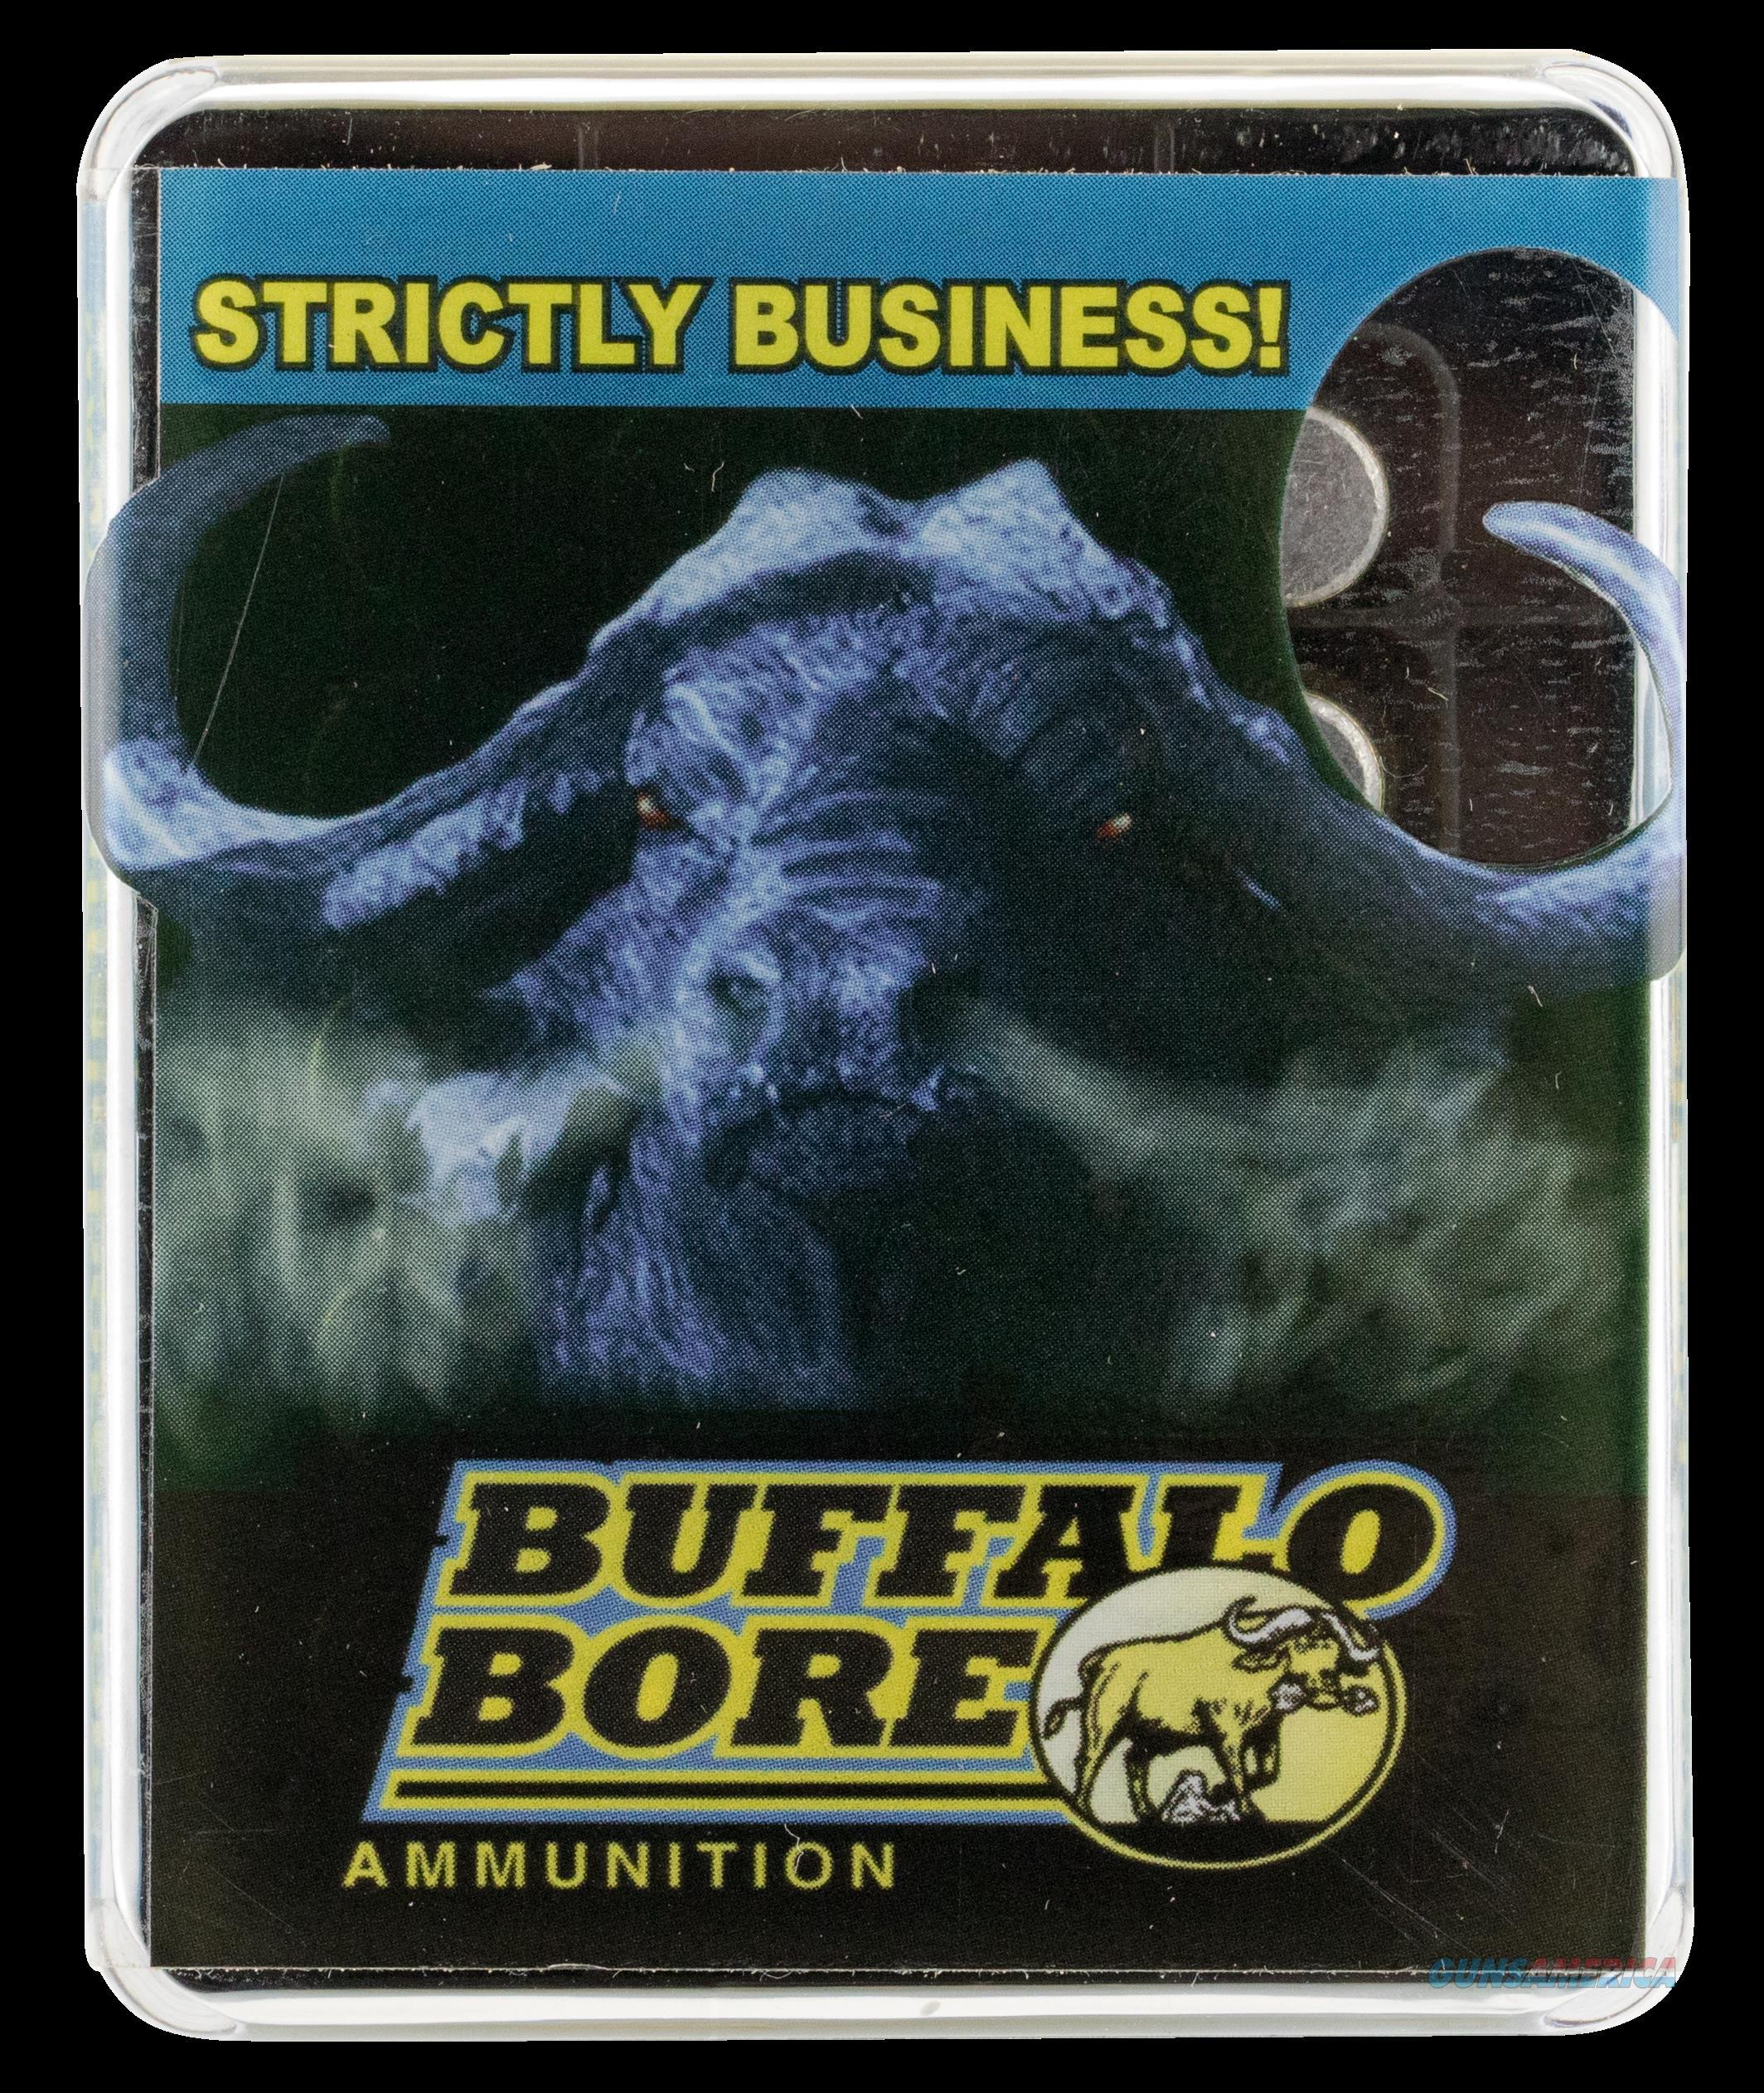 Buffalo Bore Ammunition Lower Recoil, Bba 4g-20 44rm 240g Jhp Lowrcl   20-12  Guns > Pistols > 1911 Pistol Copies (non-Colt)